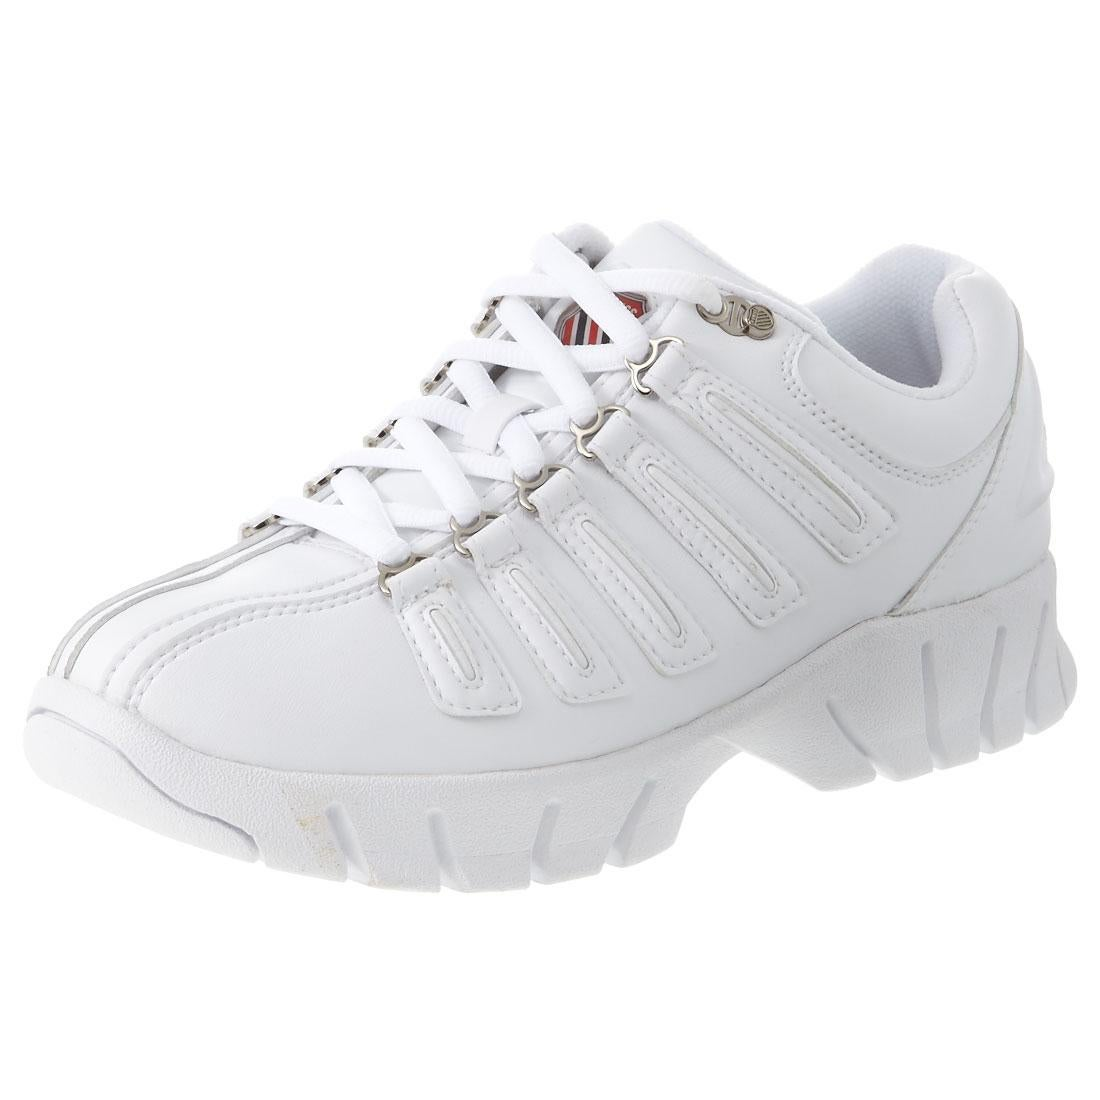 KSWISS ケースイス エバー / K・SWISS EVER(ホワイト) ,靴とファッションの通販サイト ロコンド